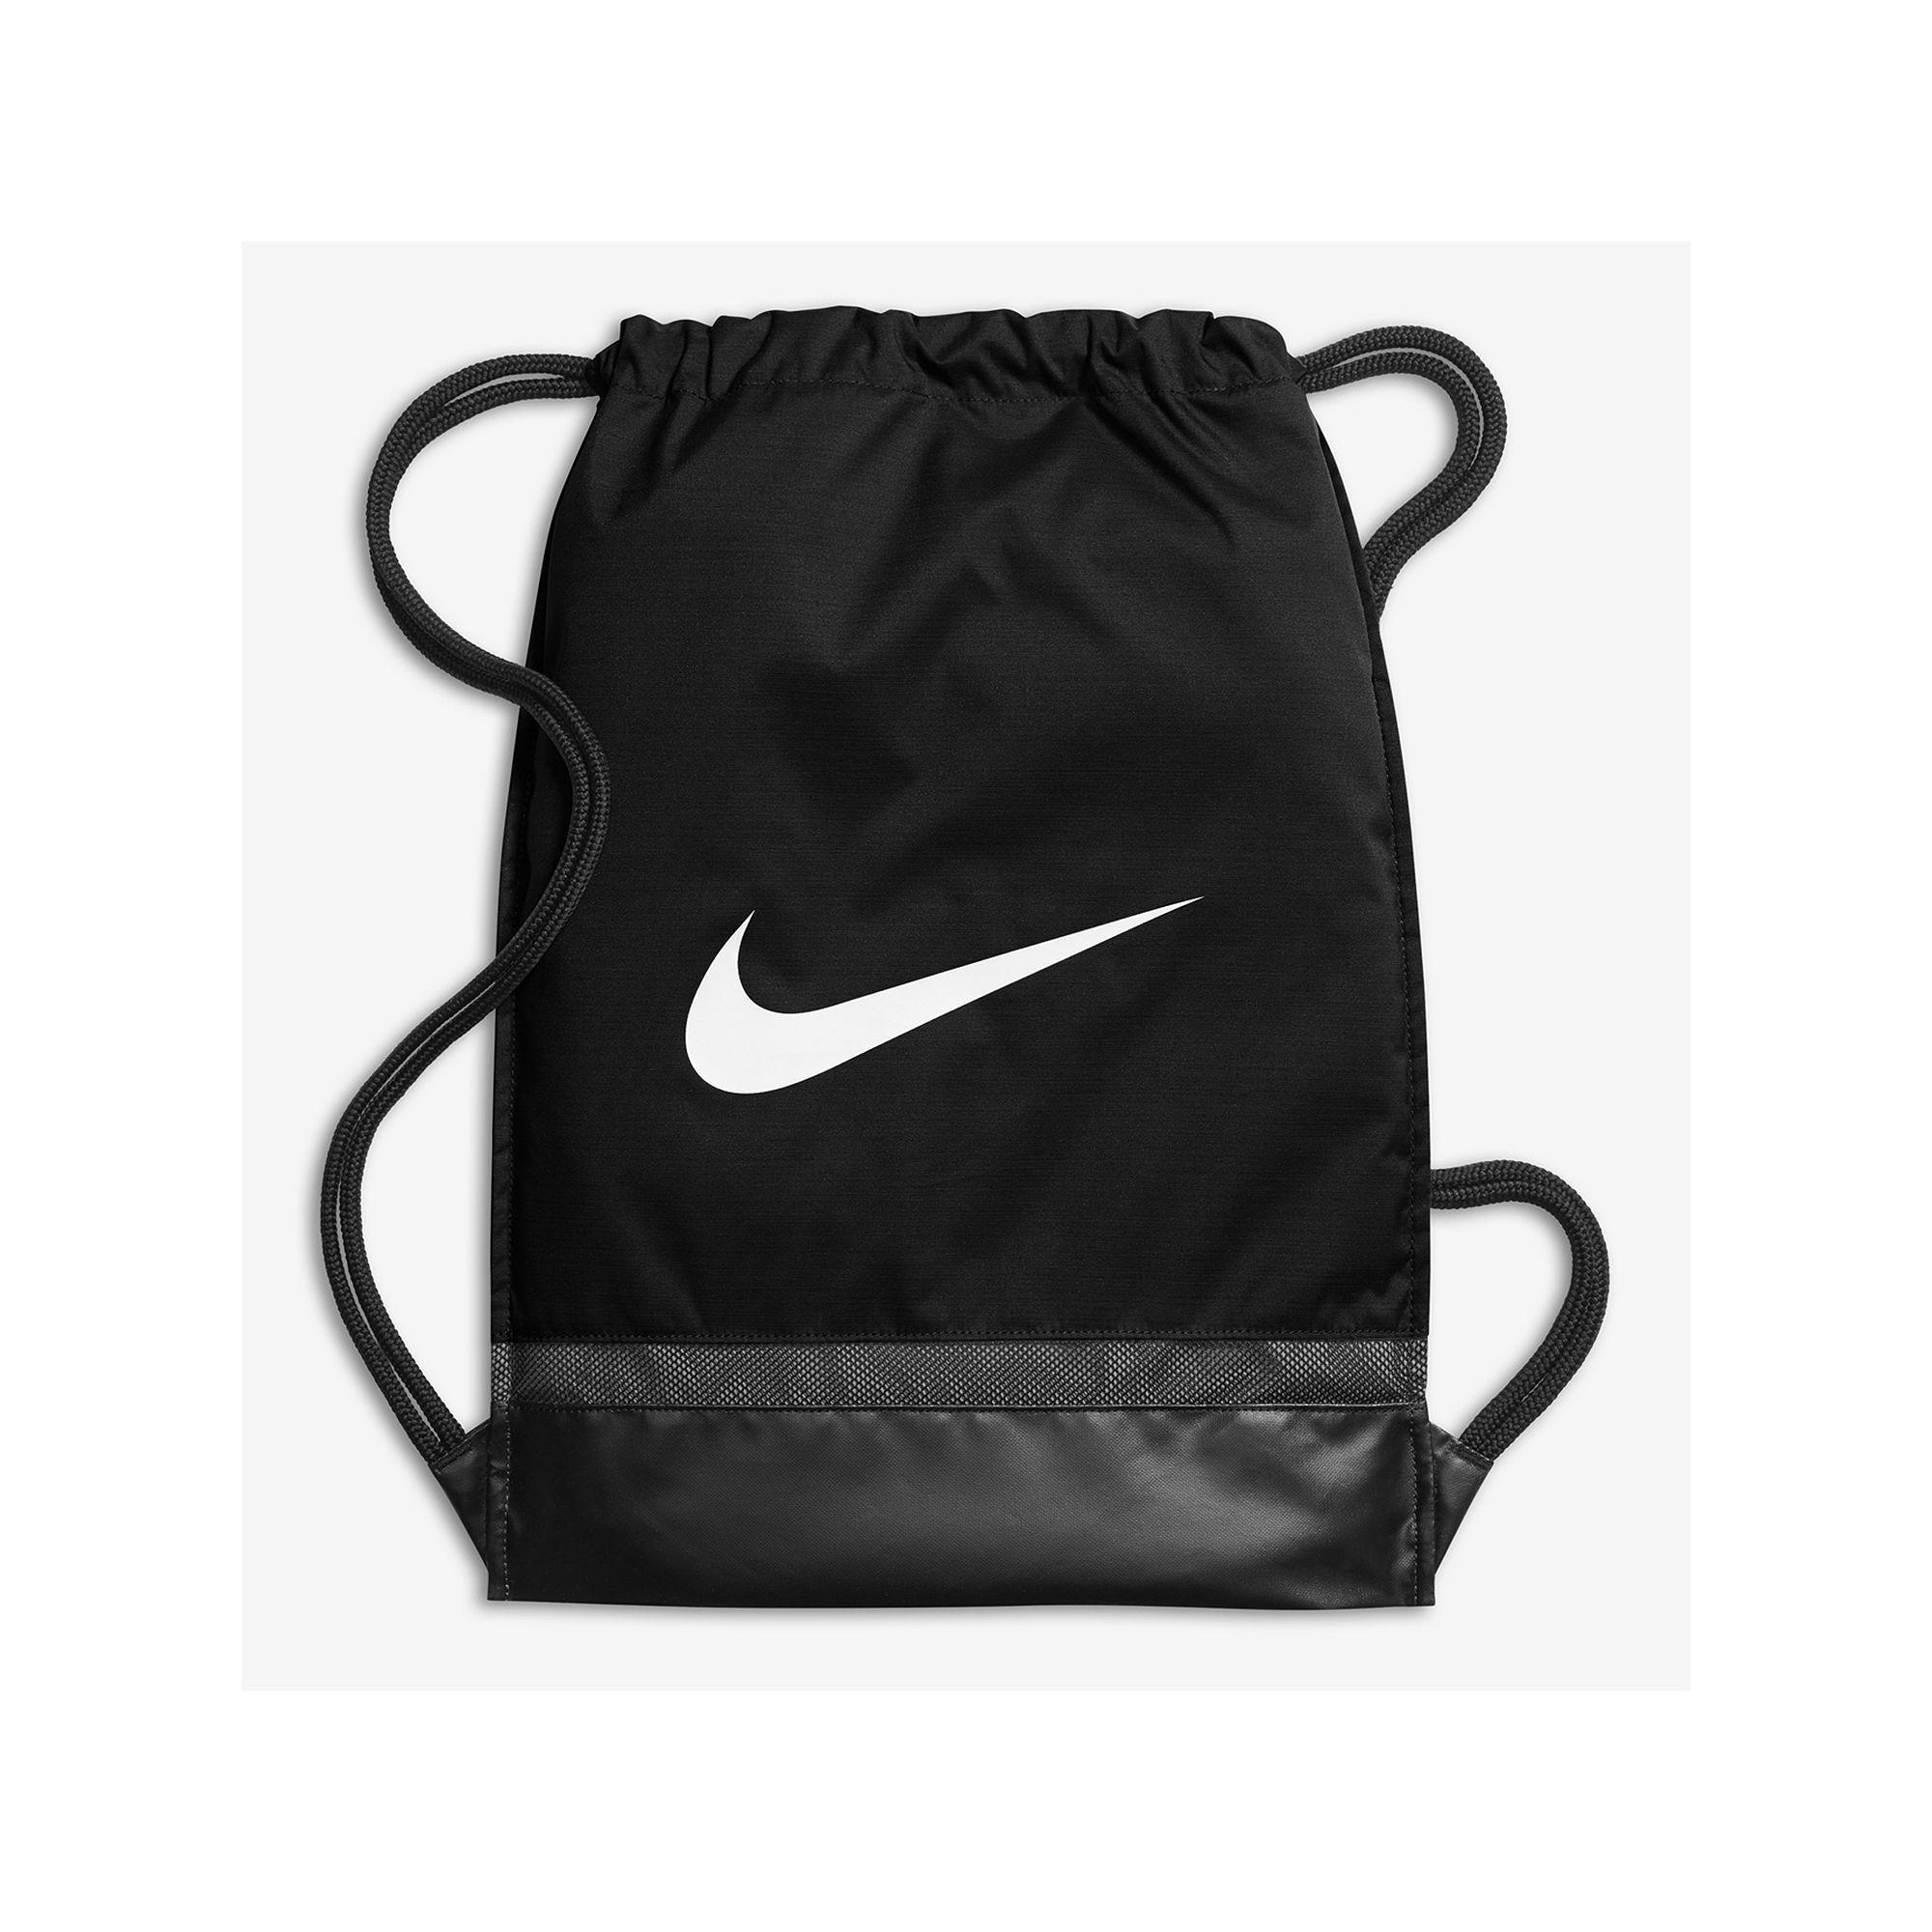 8235ca6239 Nike Brasilia Drawstring Backpack